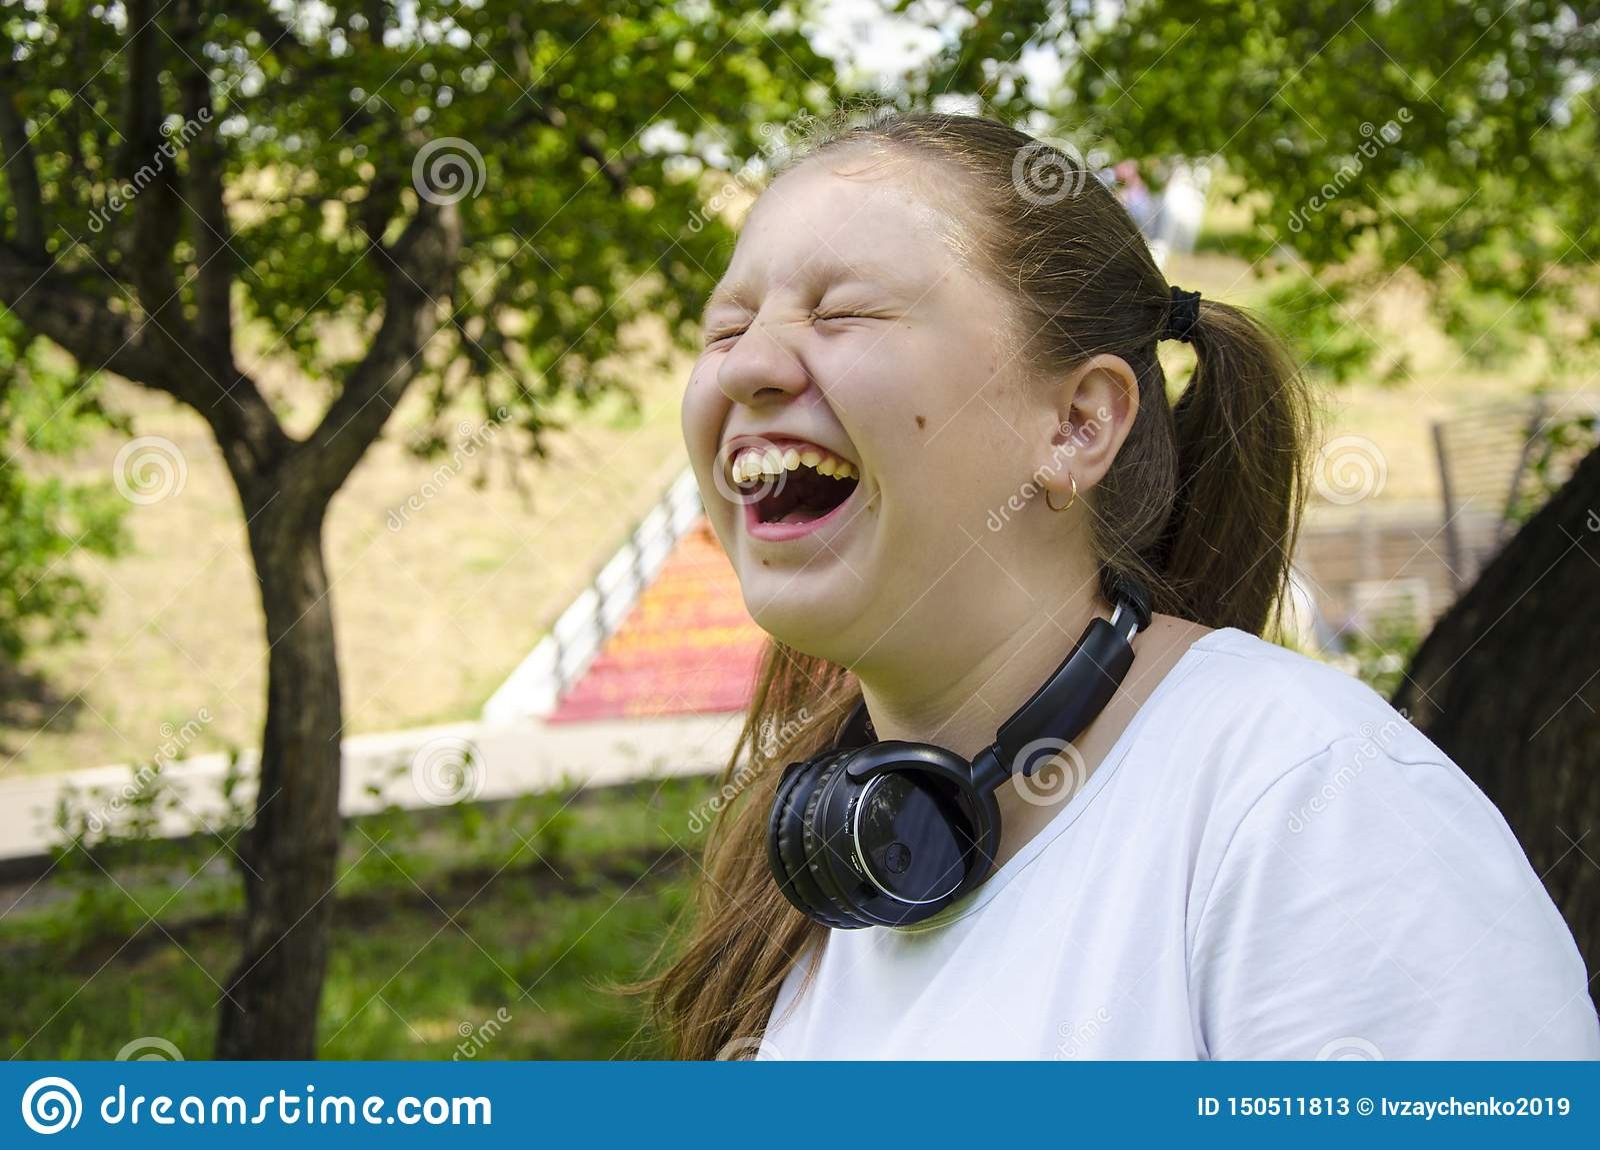 Teen girl explosive emotions. Summer day